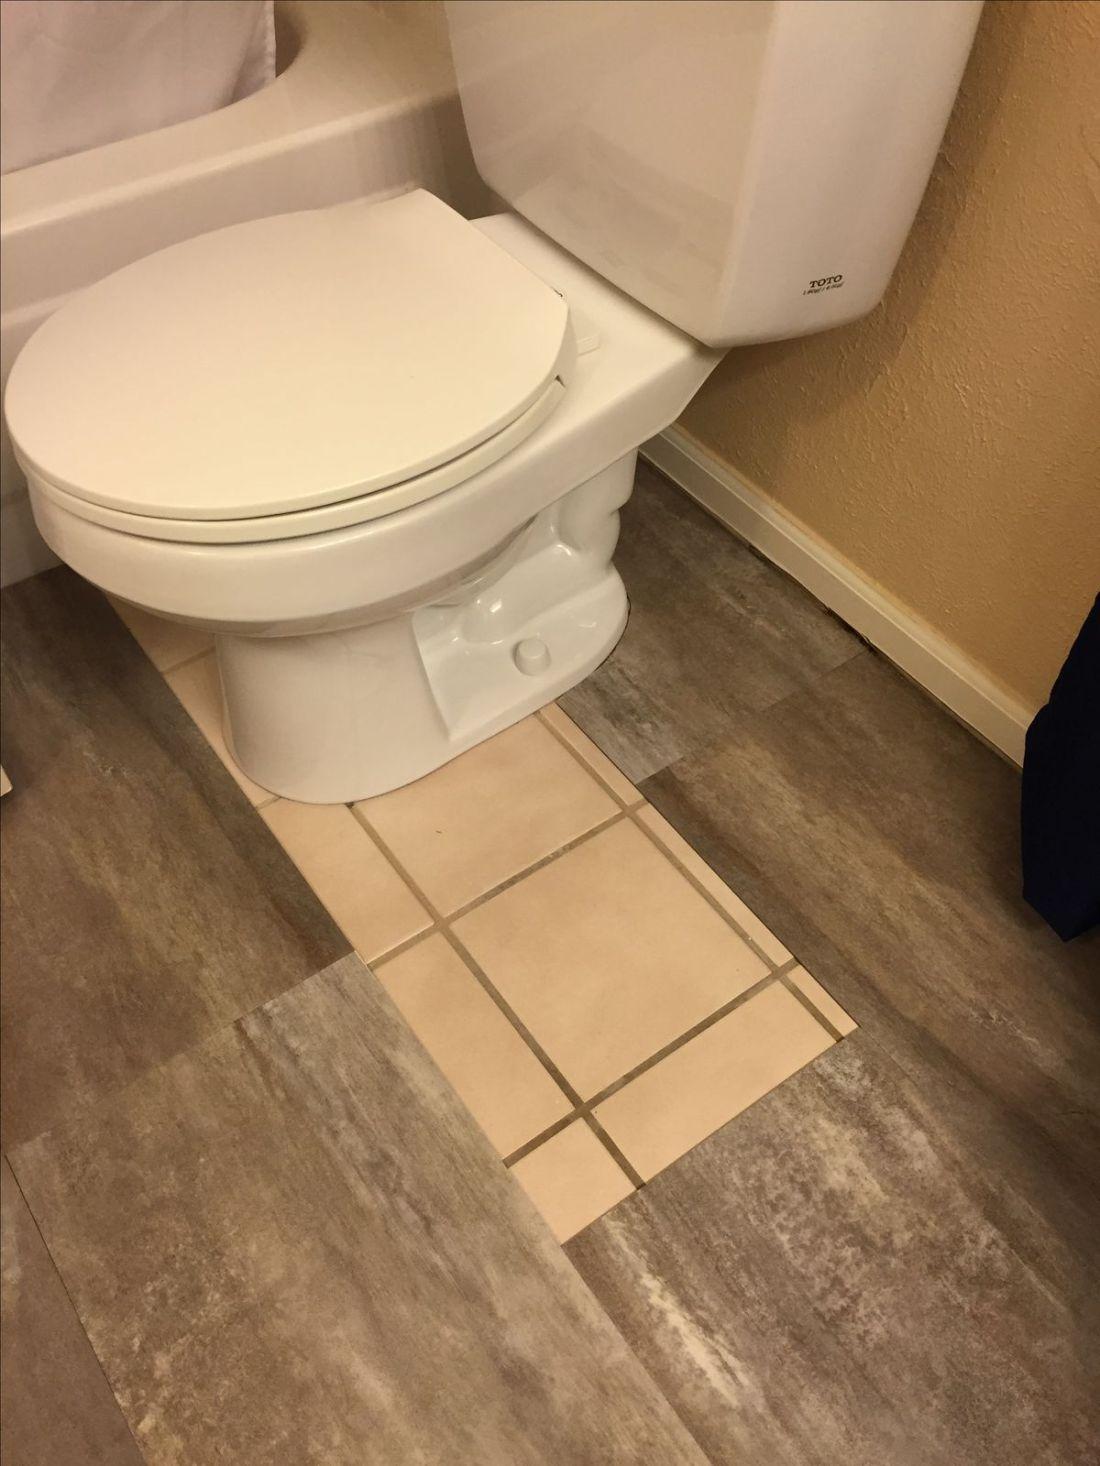 Diy luxury vinyl tile cover ugly old tile bathroom redo